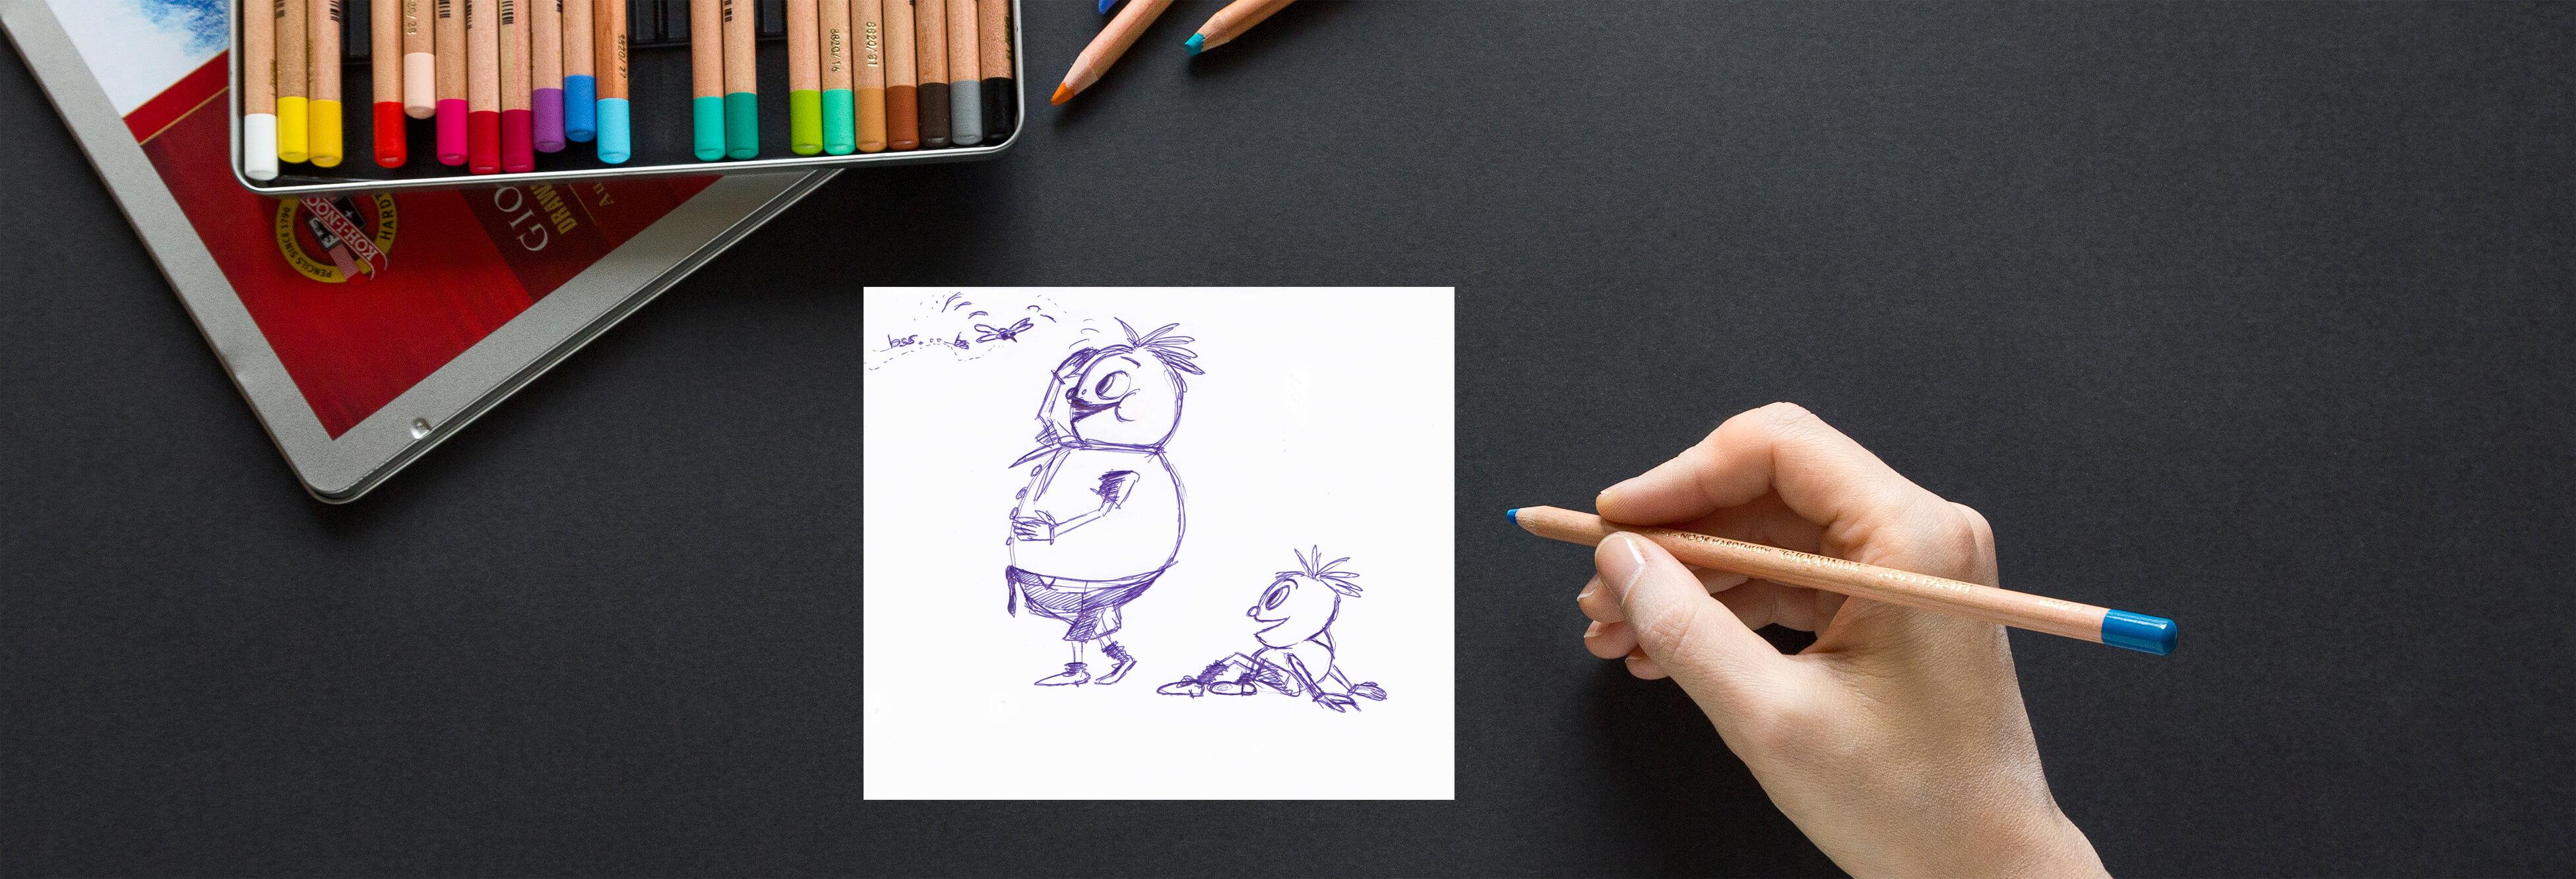 content expertin Sketchnotes